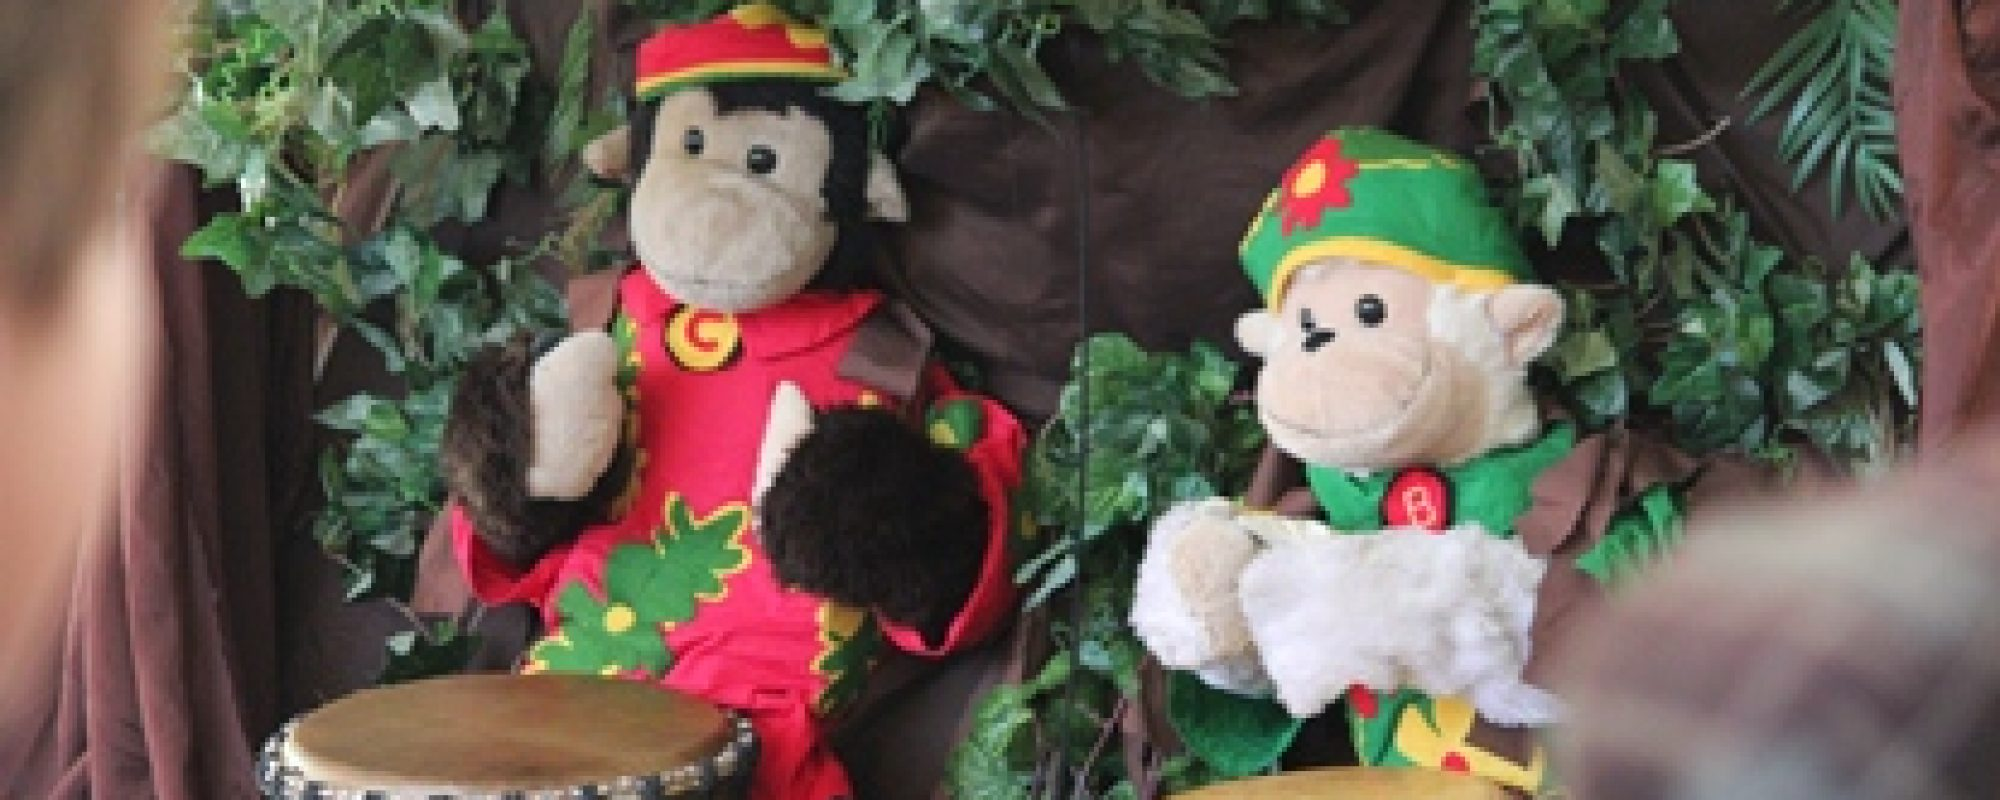 nannup_monkeys